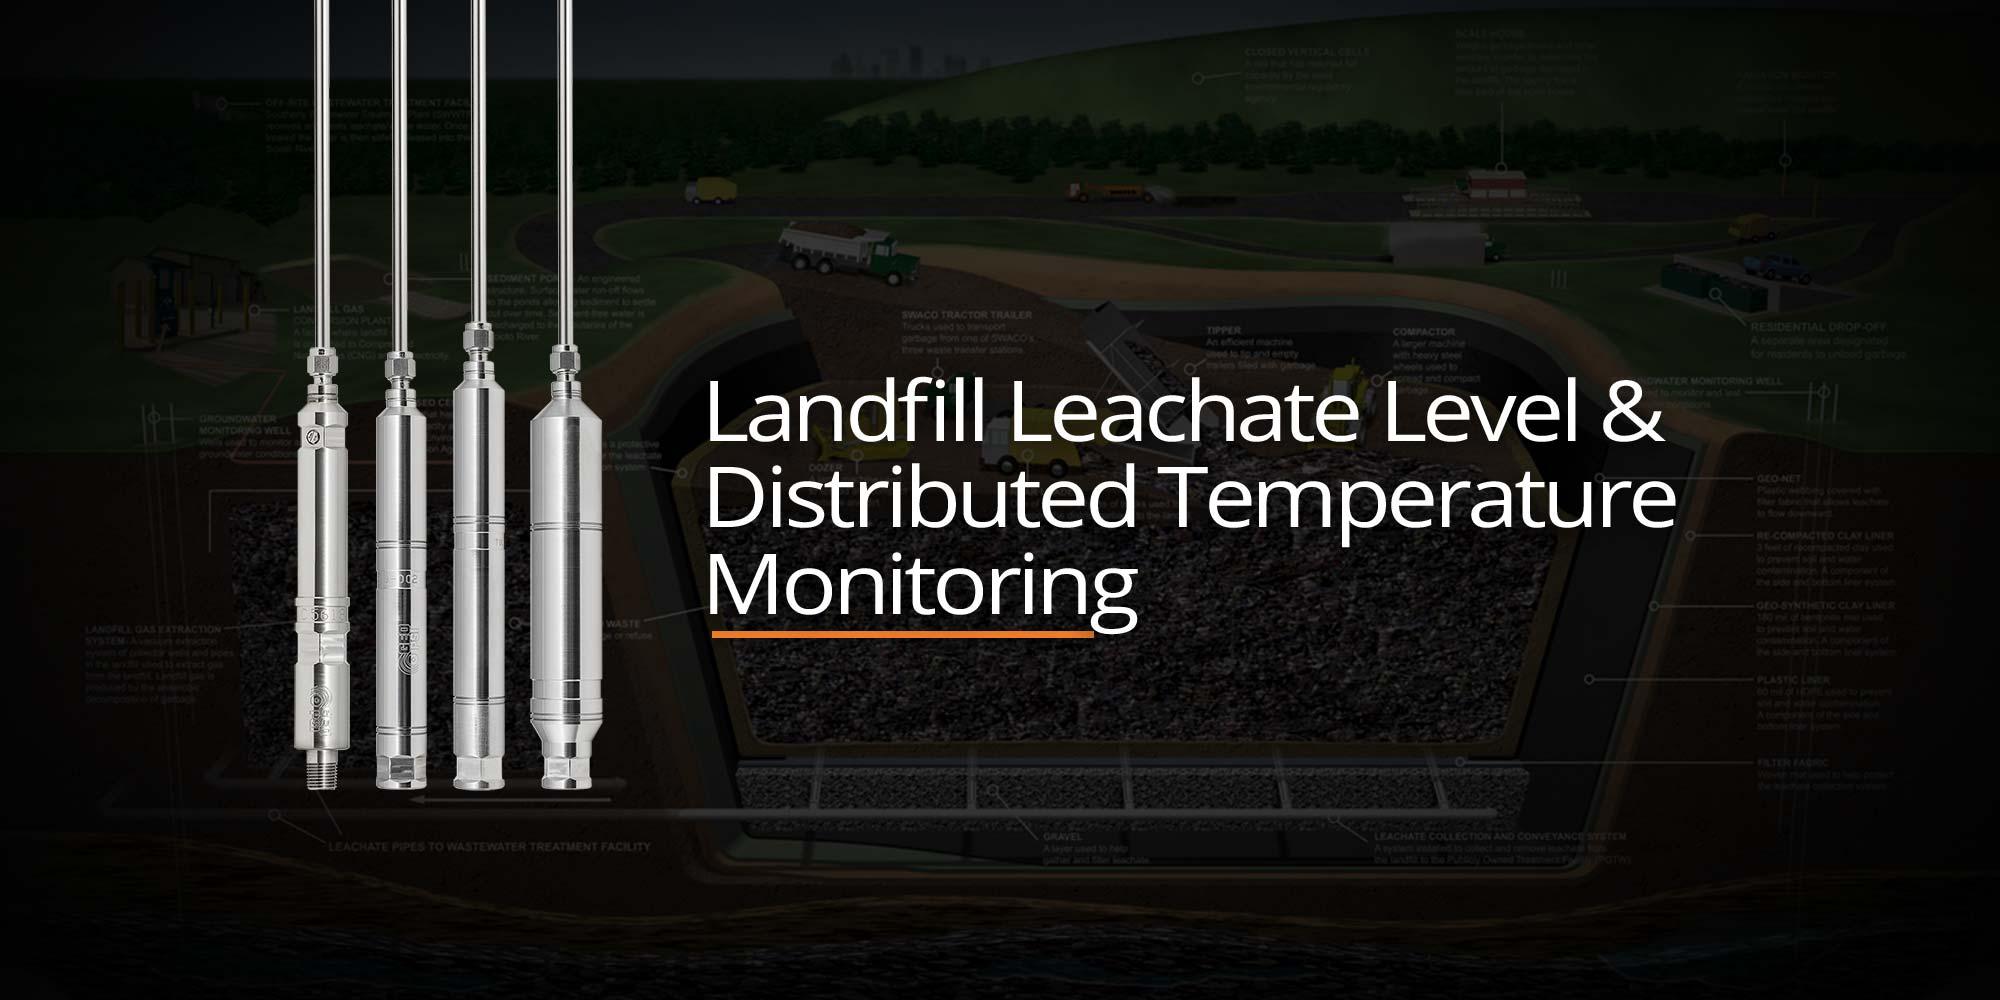 Landfill Leachate Level & Distributed Temperature Monitoring